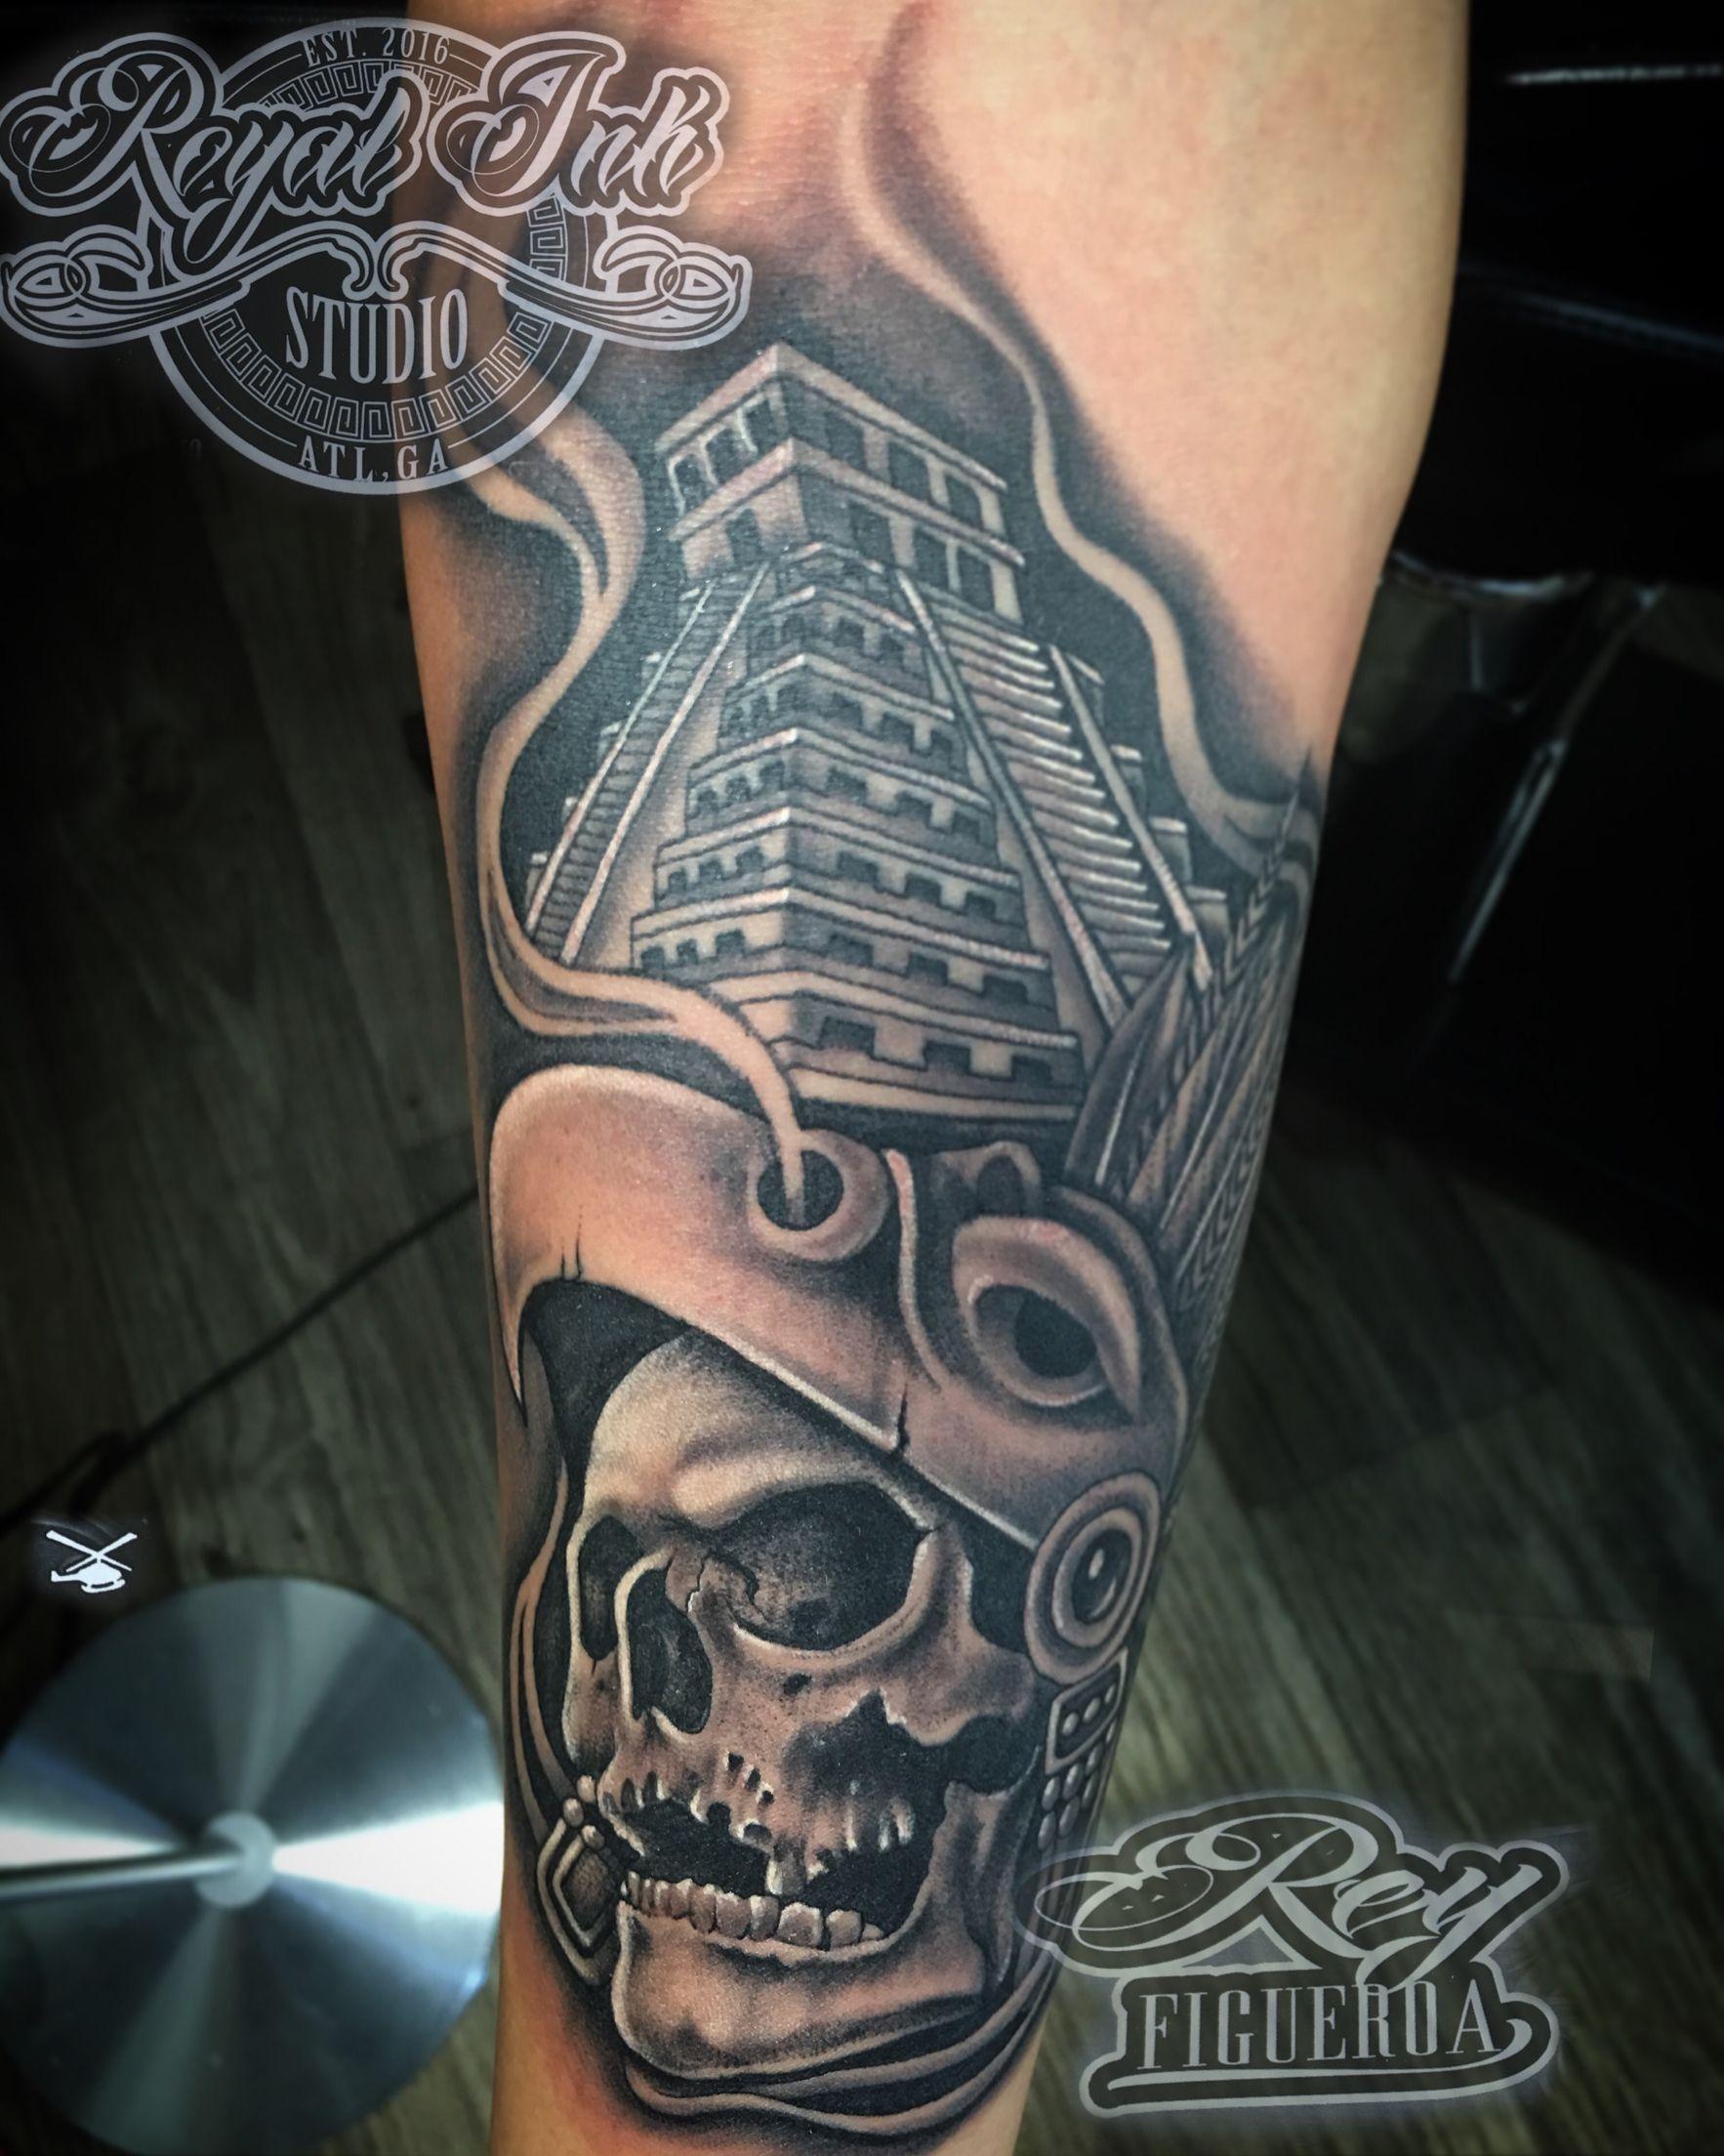 ee2ea169bc163019cacd364673cef45f - Trash Polka Tattoo Artists Near Me